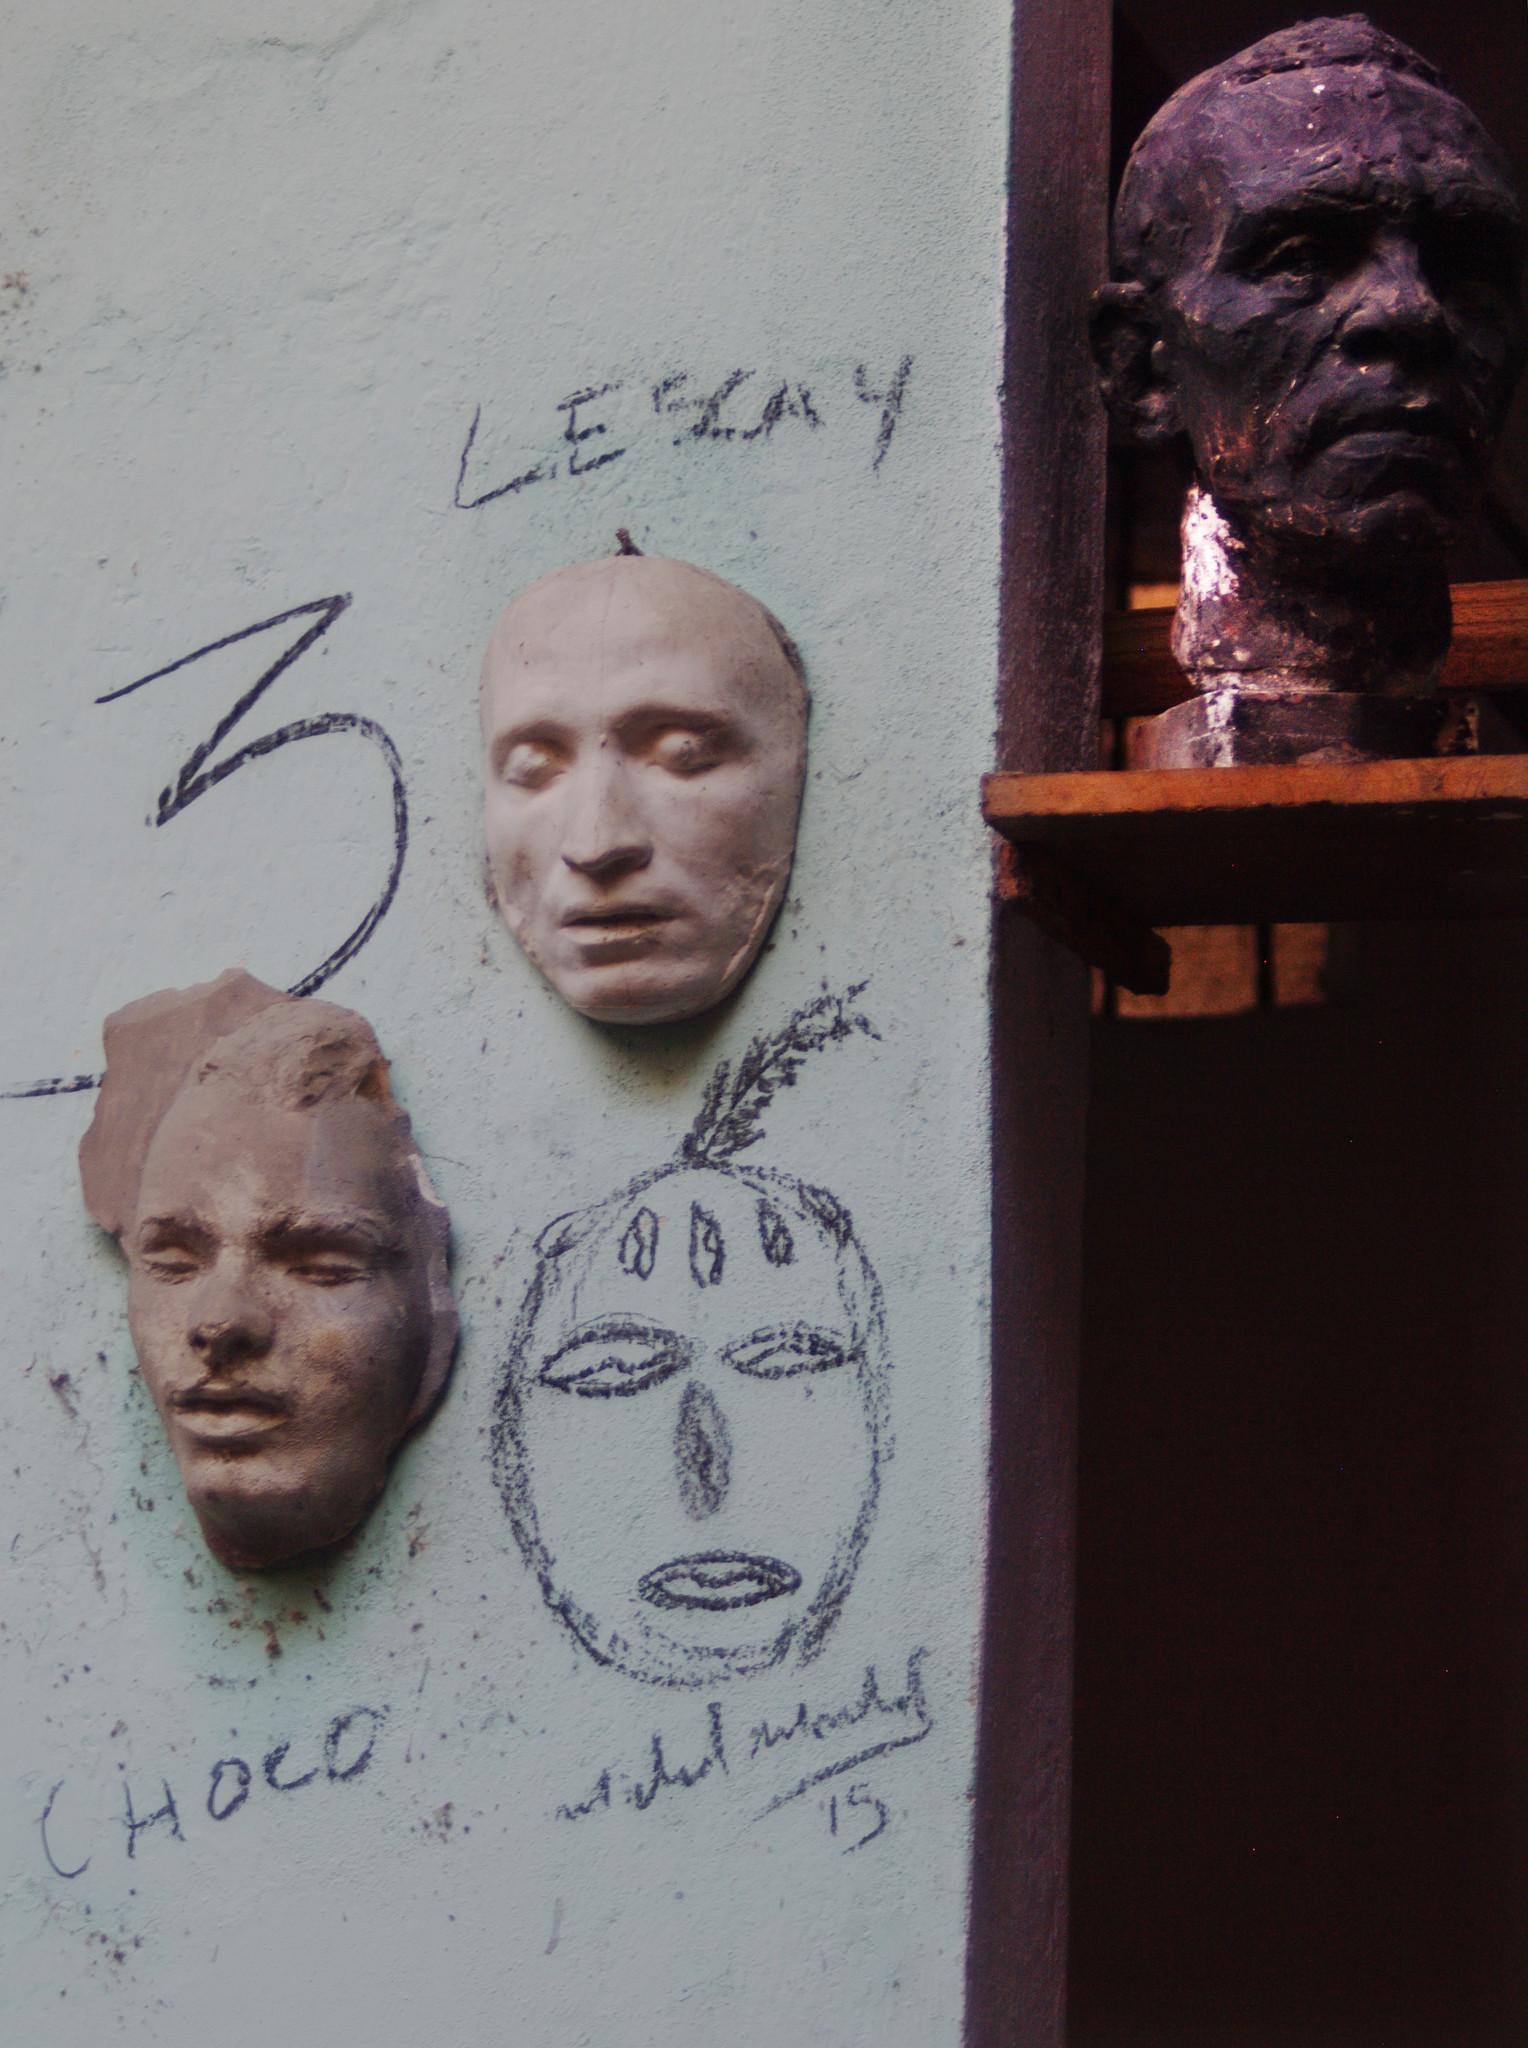 Sculptures at the workshop of Cuban artist Alberto Lescay.